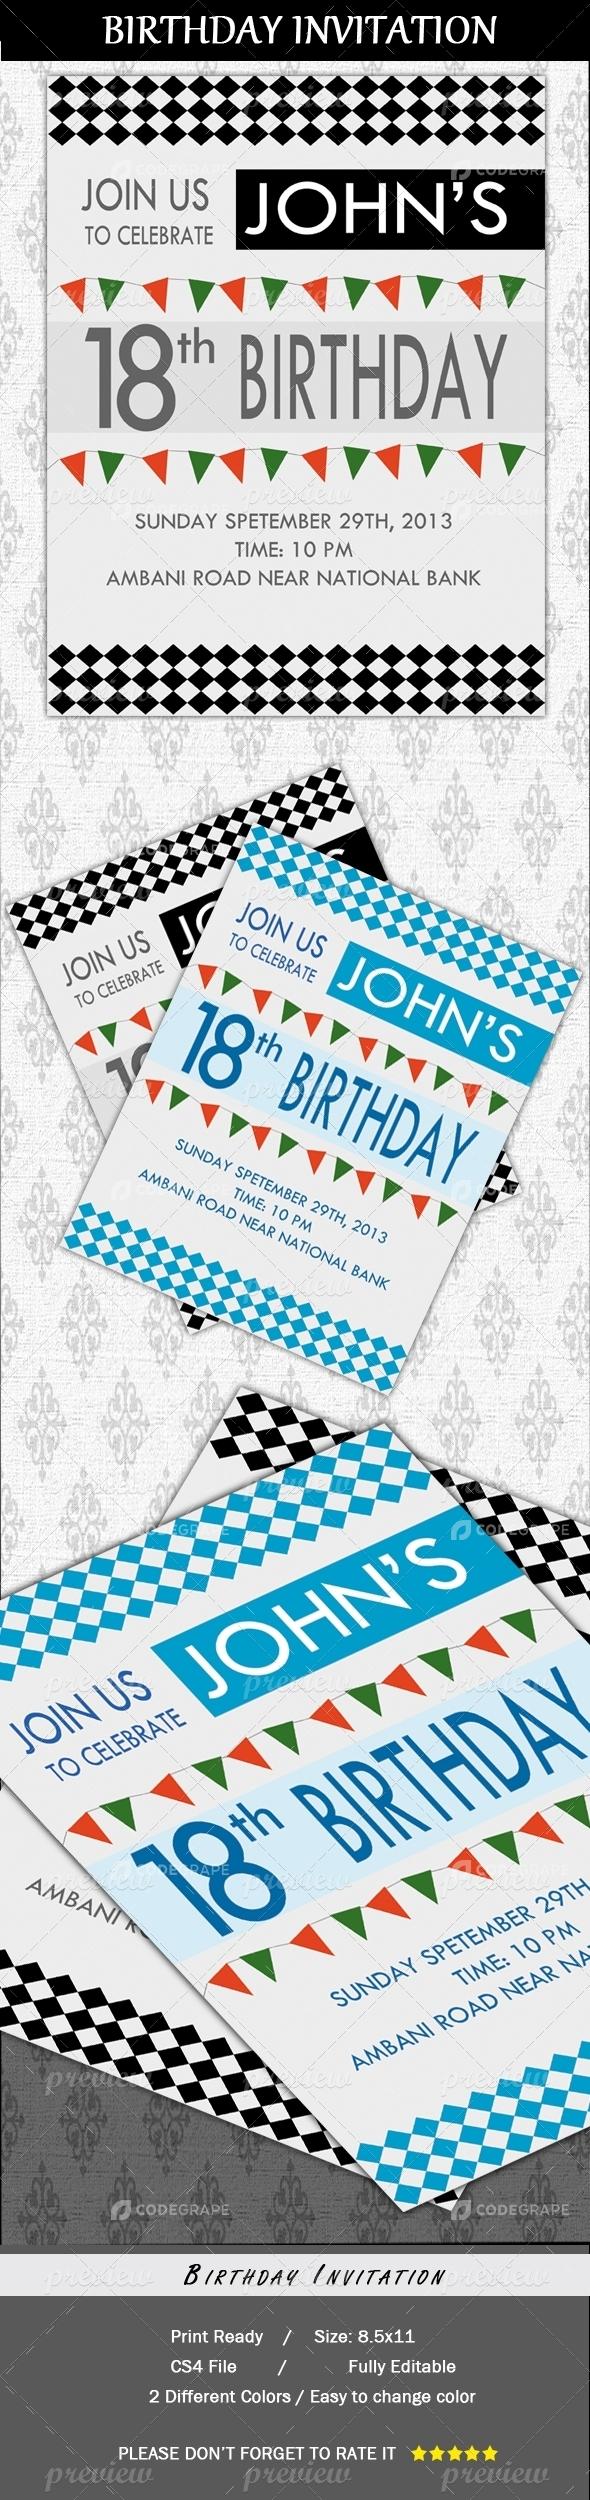 Birthday Party Invitation Cards